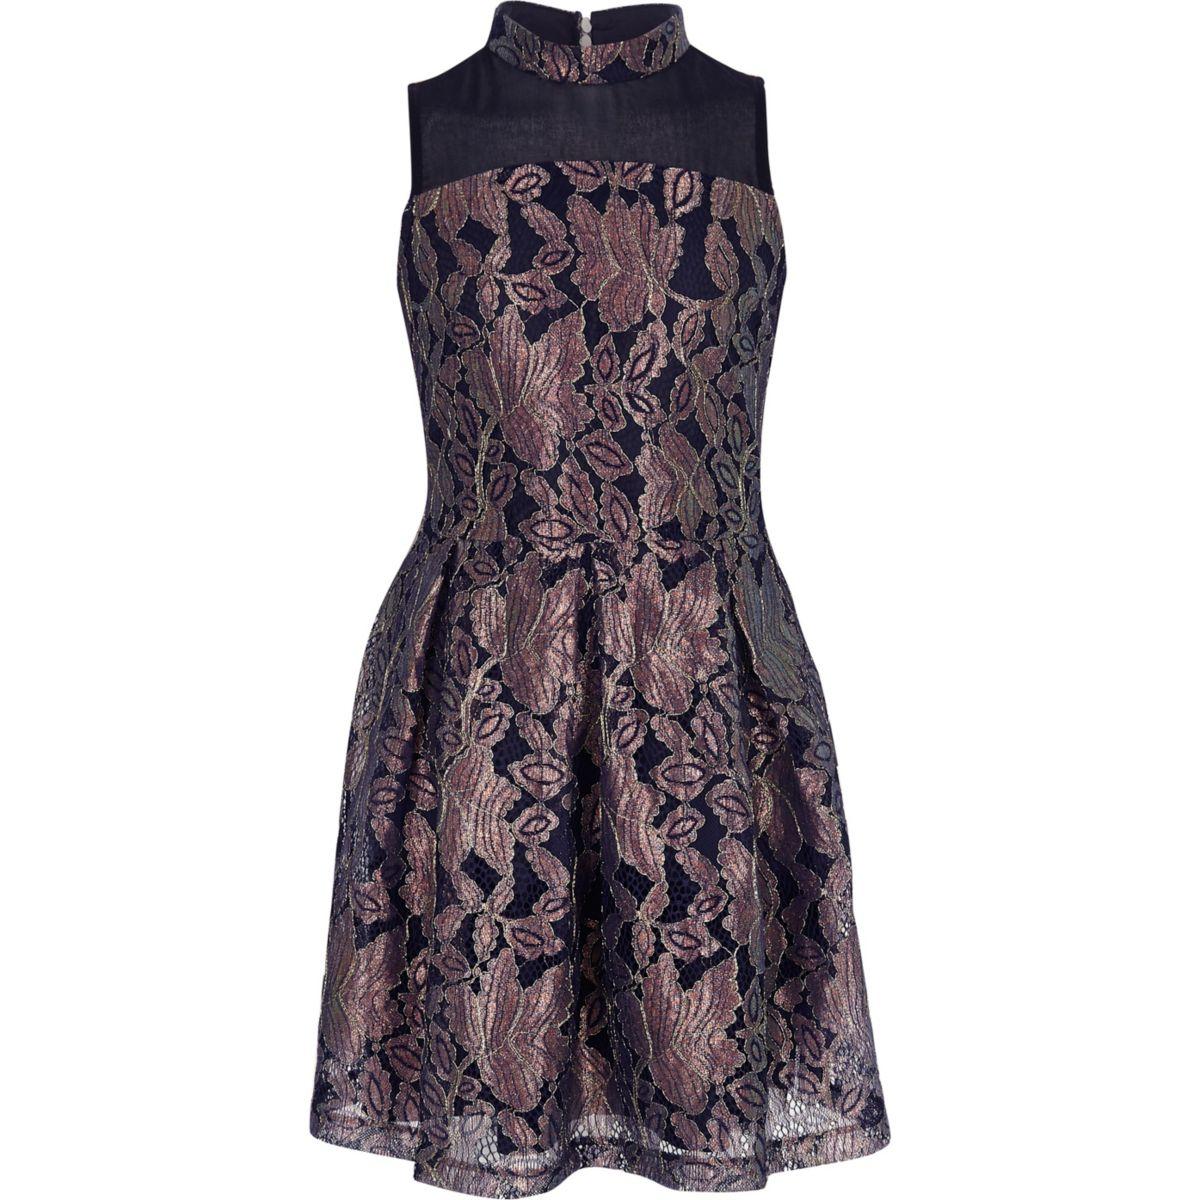 Girls navy metallic lace prom dress